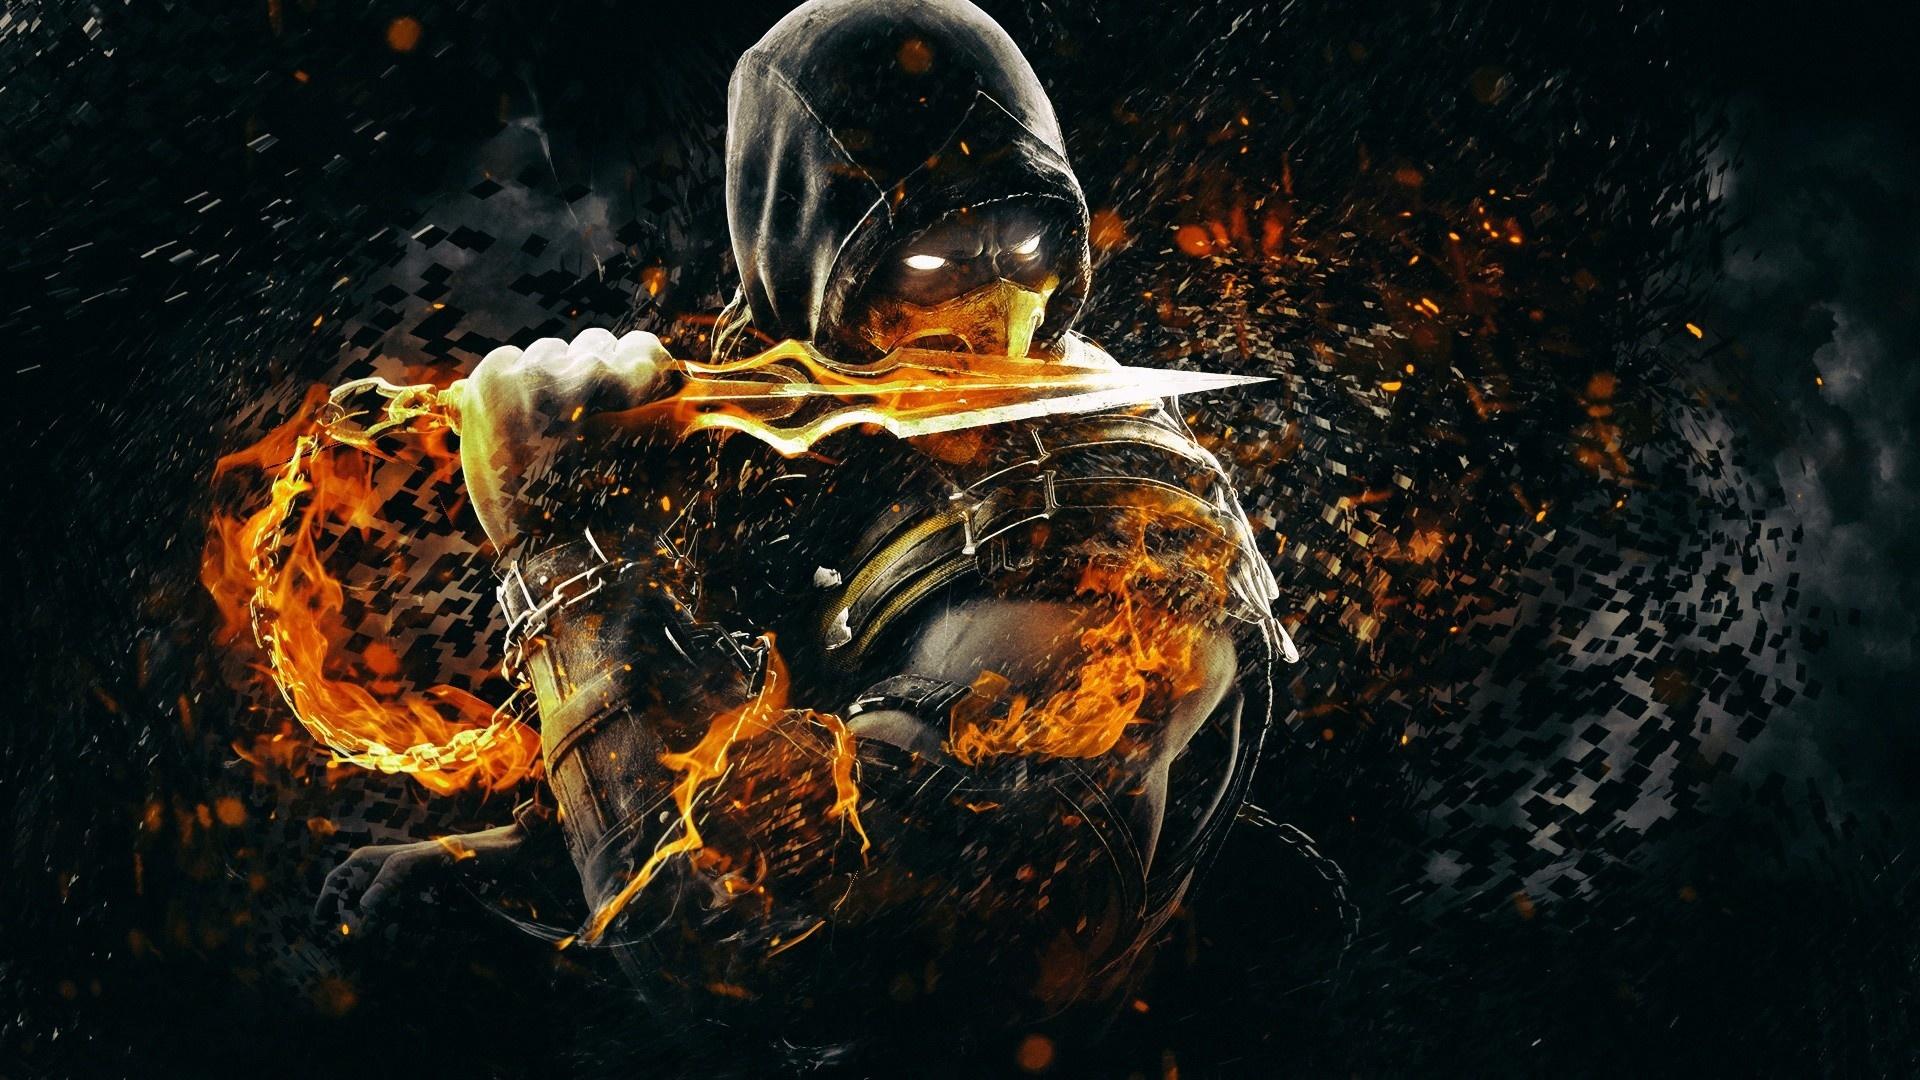 1152x864 Scorpion Mortal Kombat Game 1152x864 Resolution